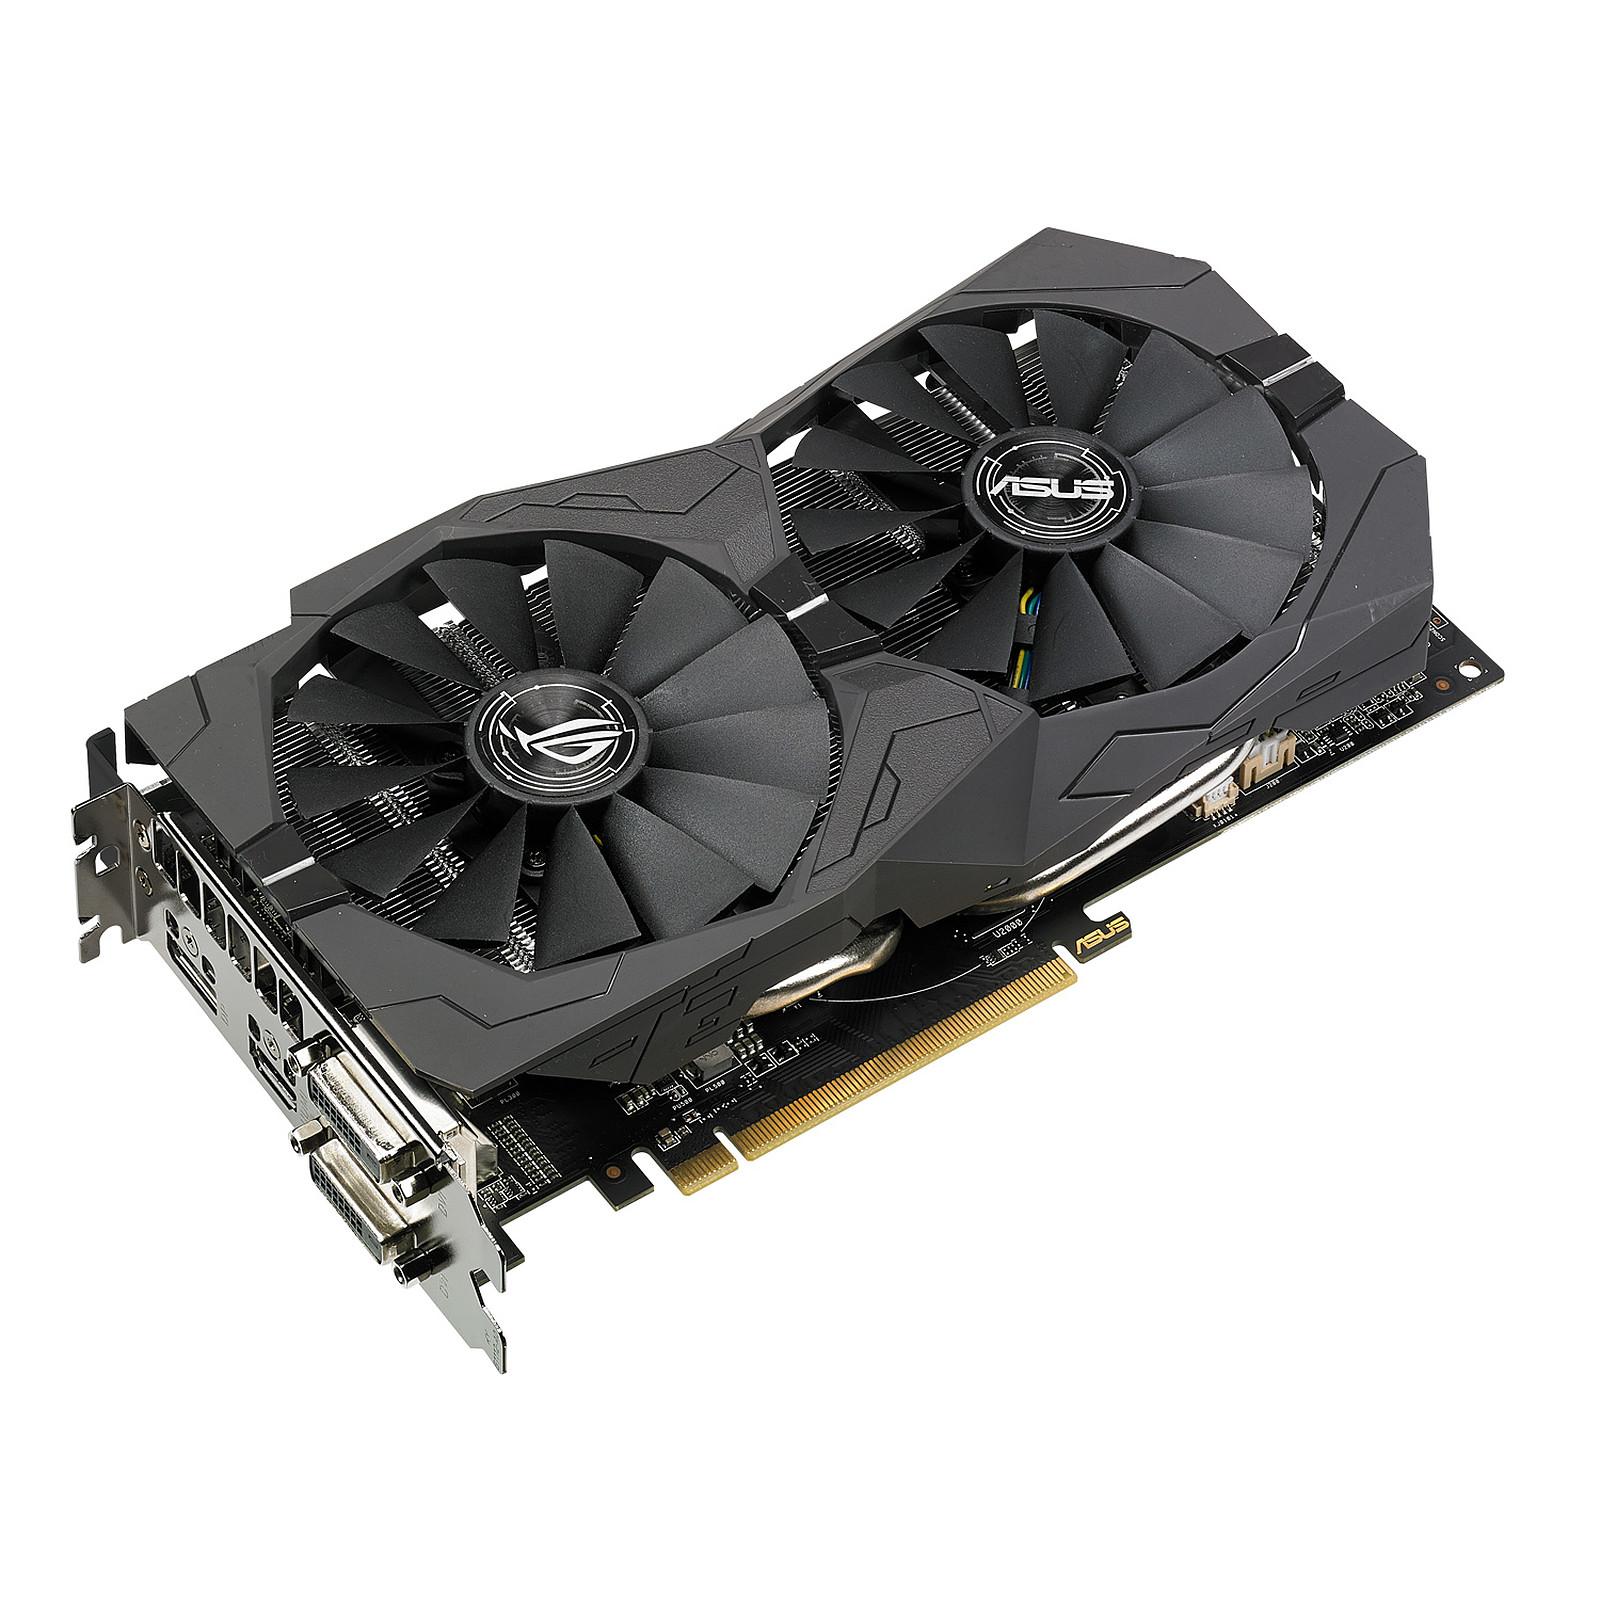 ASUS ROG STRIX AMD Radeon RX 570 4G Gaming